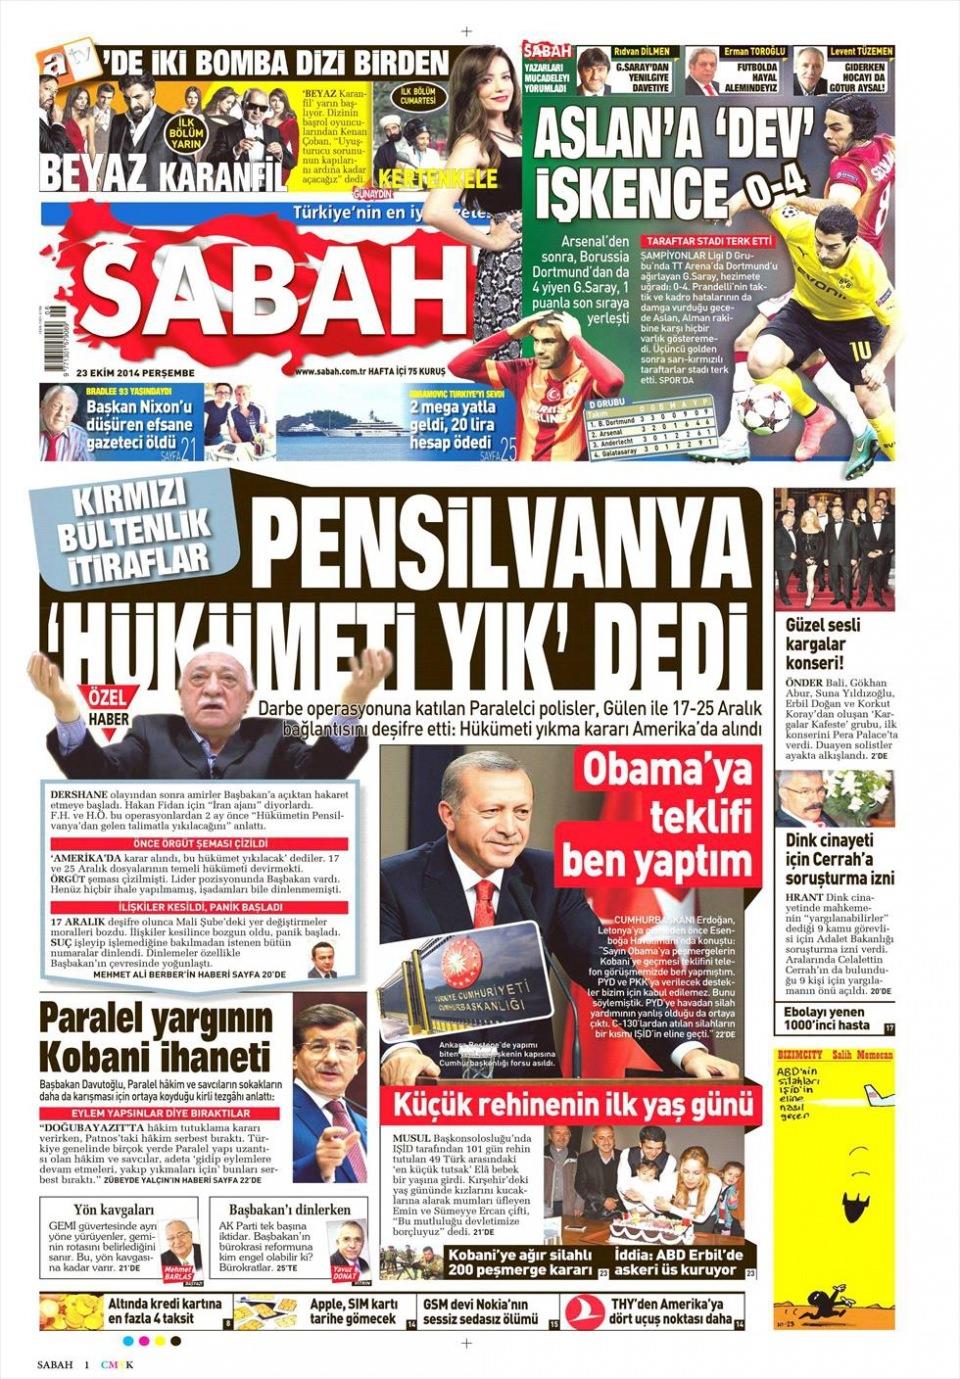 23 Ekim 2014 gazete manşetleri 14